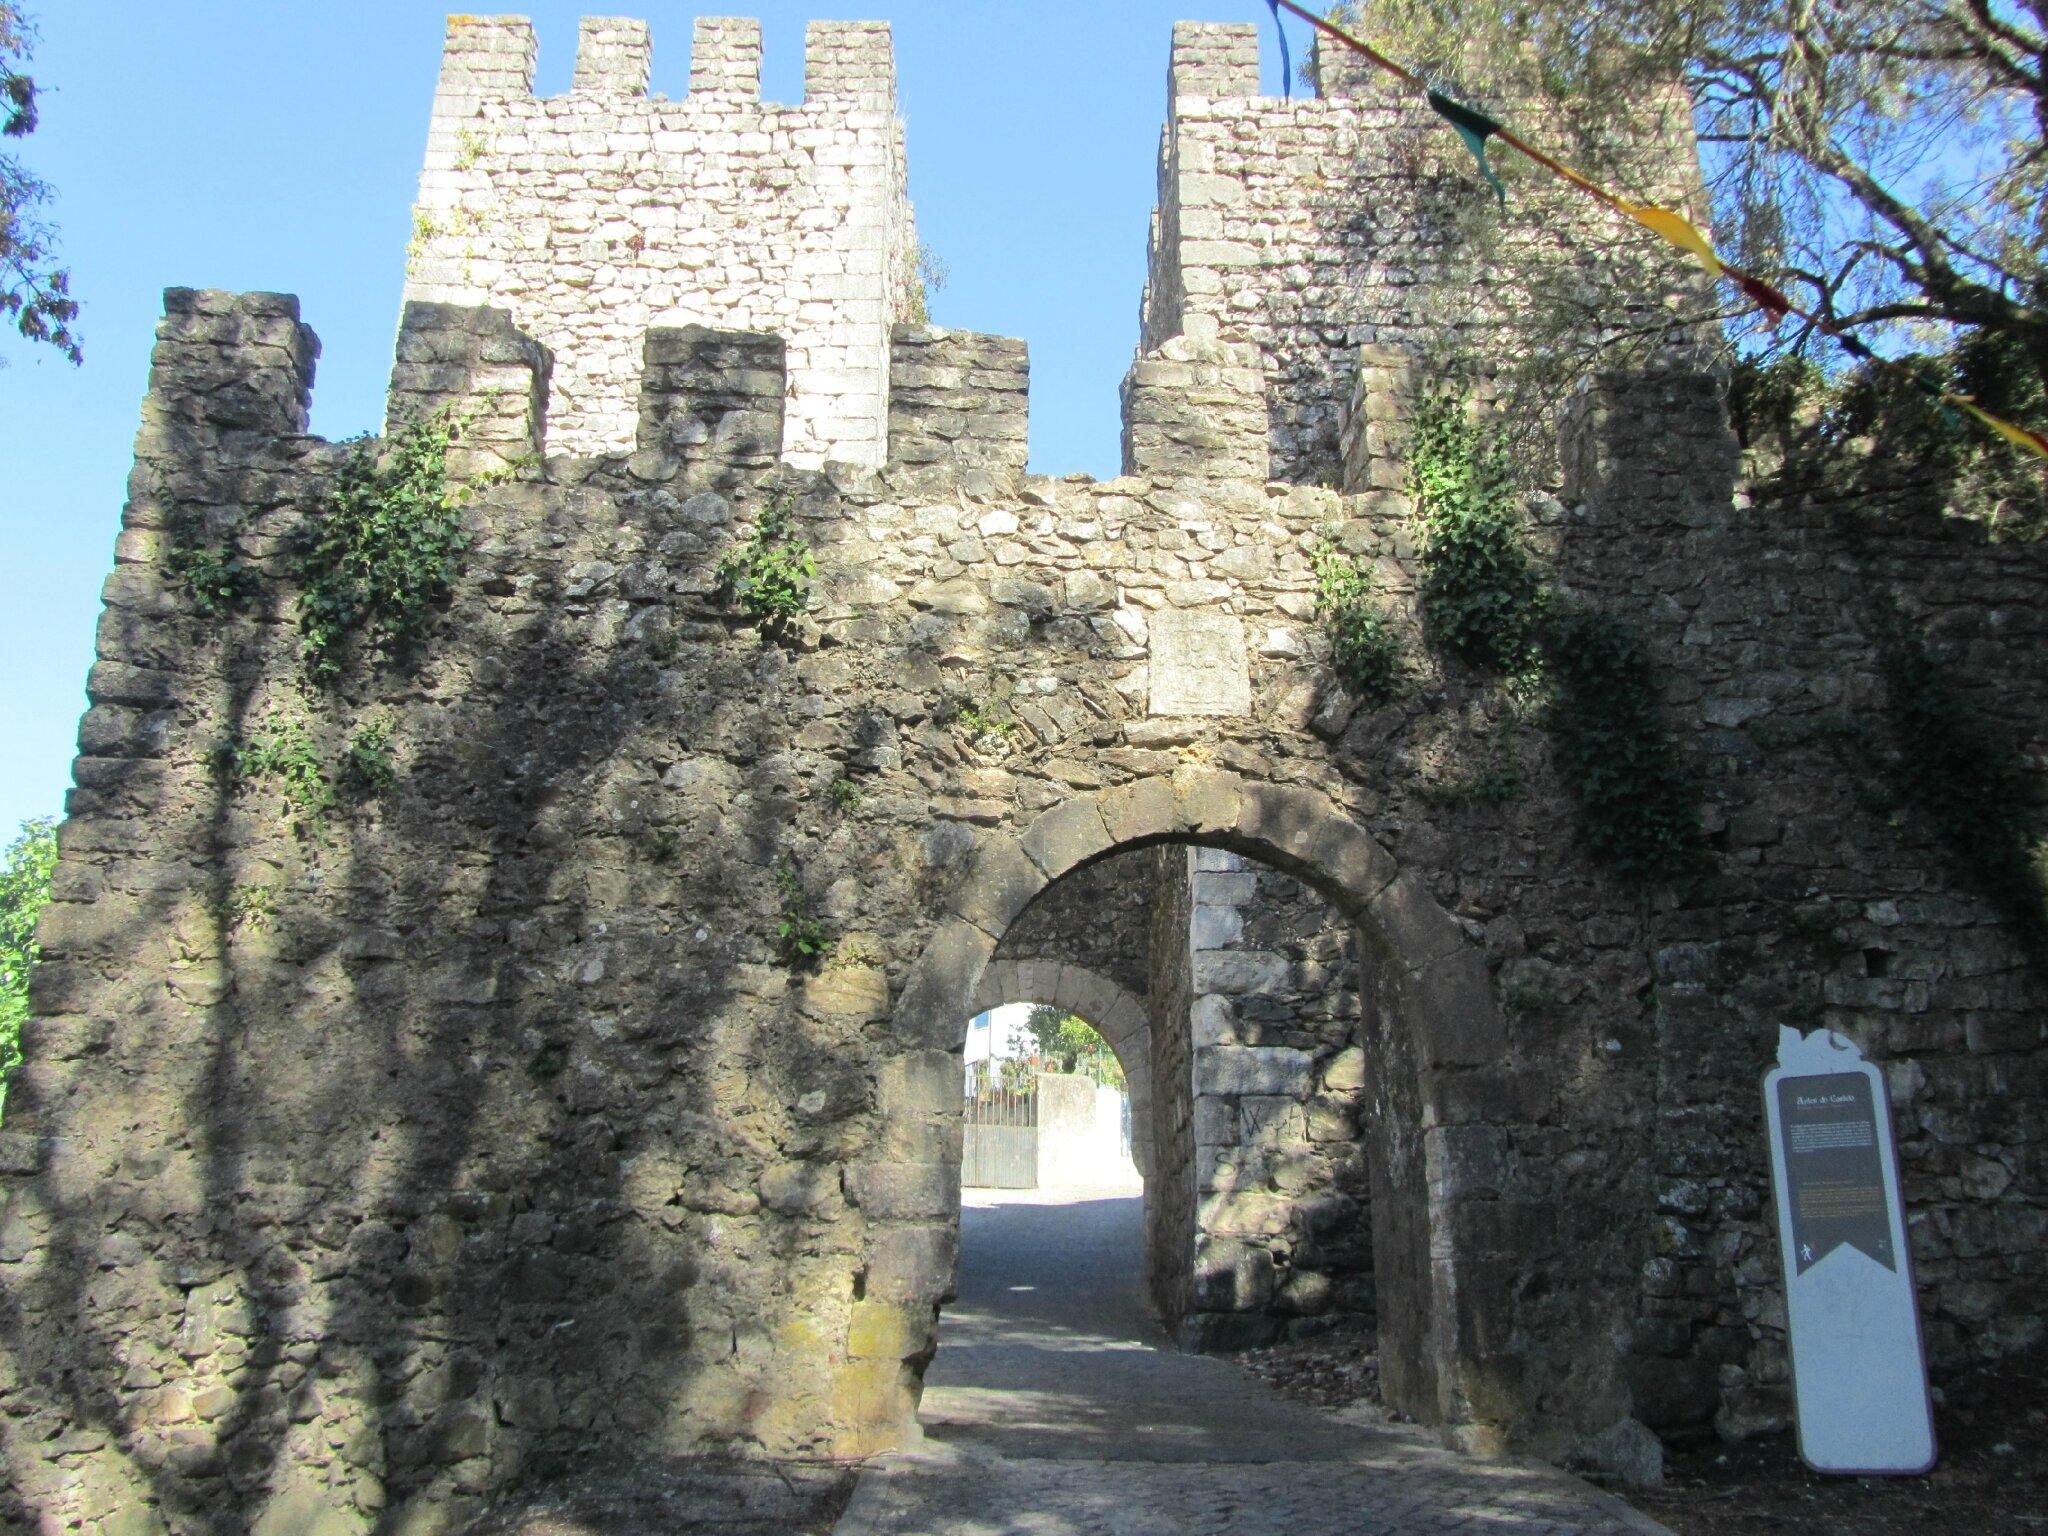 15 juillet 2017 - Séjour au Portugal : Leiria